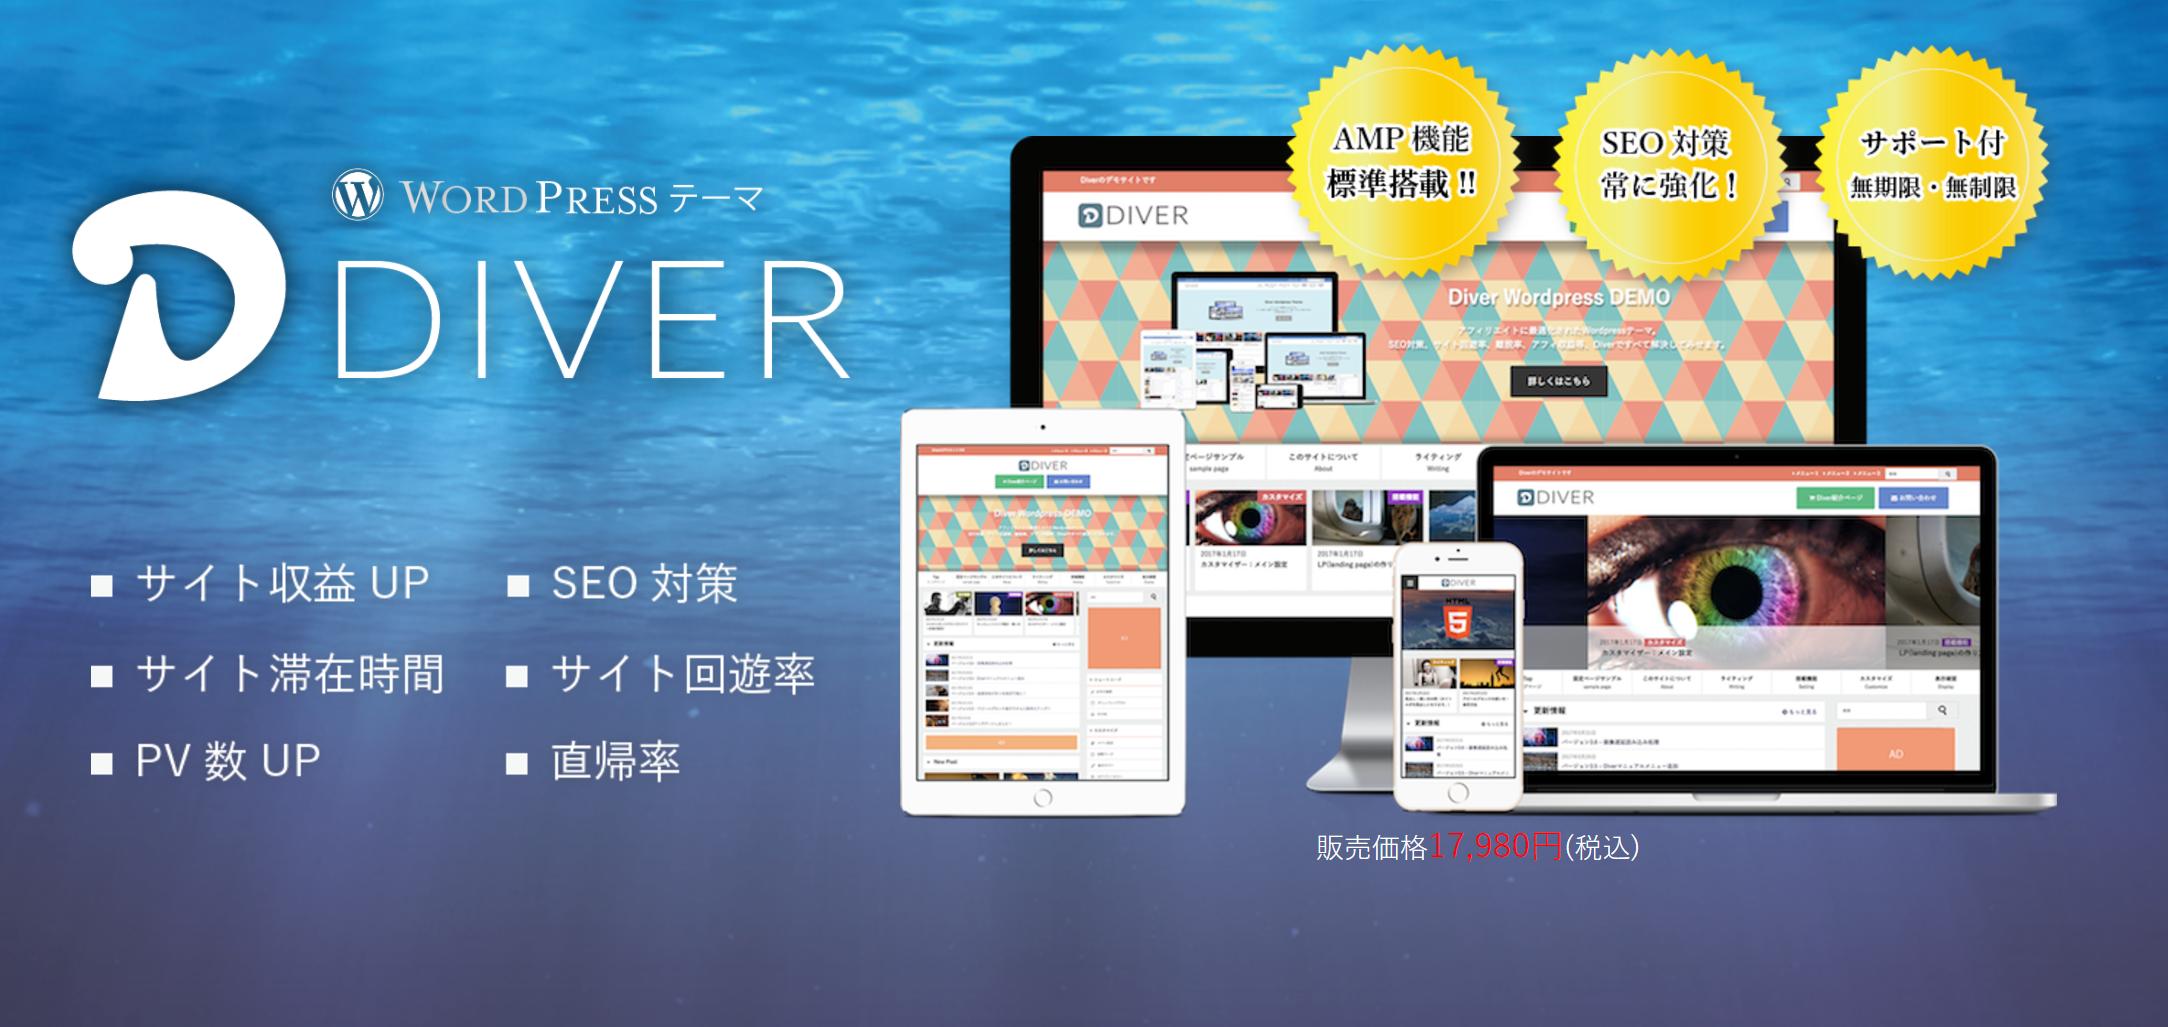 diver - WordPressの有料テーマを使うメリットと初心者におすすめ15選を紹介